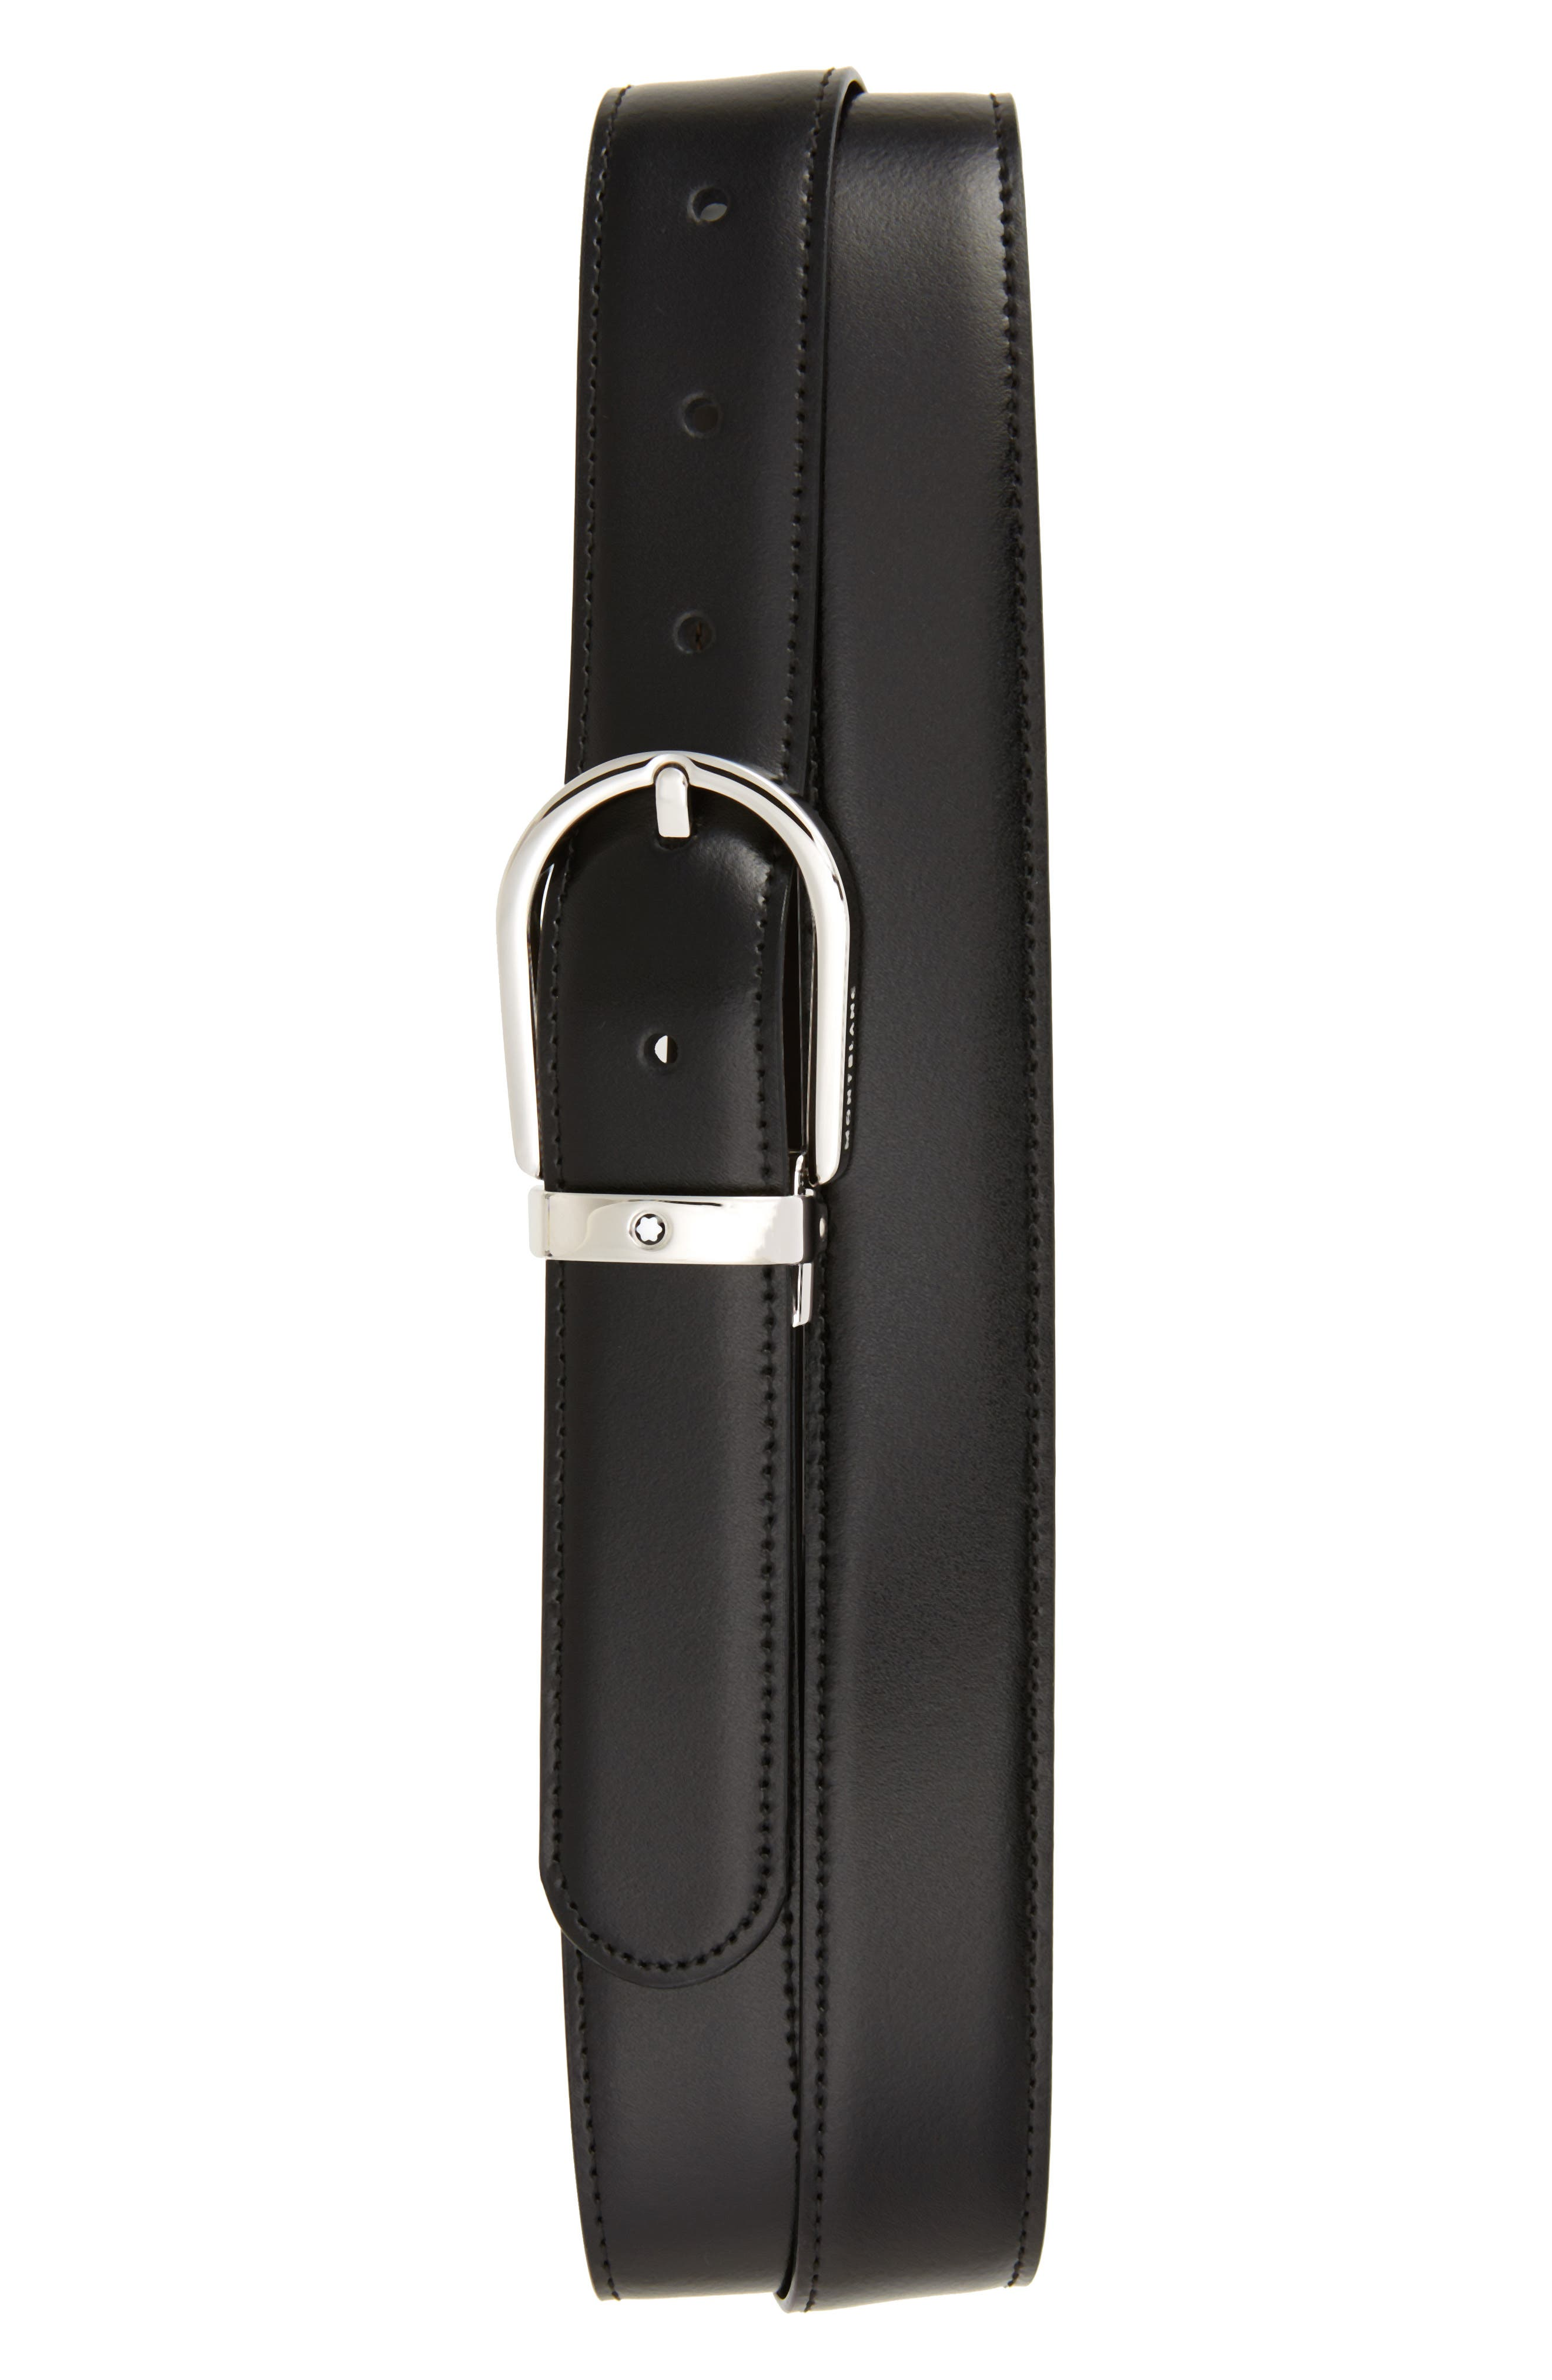 MONTBLANC, Horseshoe Buckle Reversible Leather Belt, Main thumbnail 1, color, BLACK/ BROWN